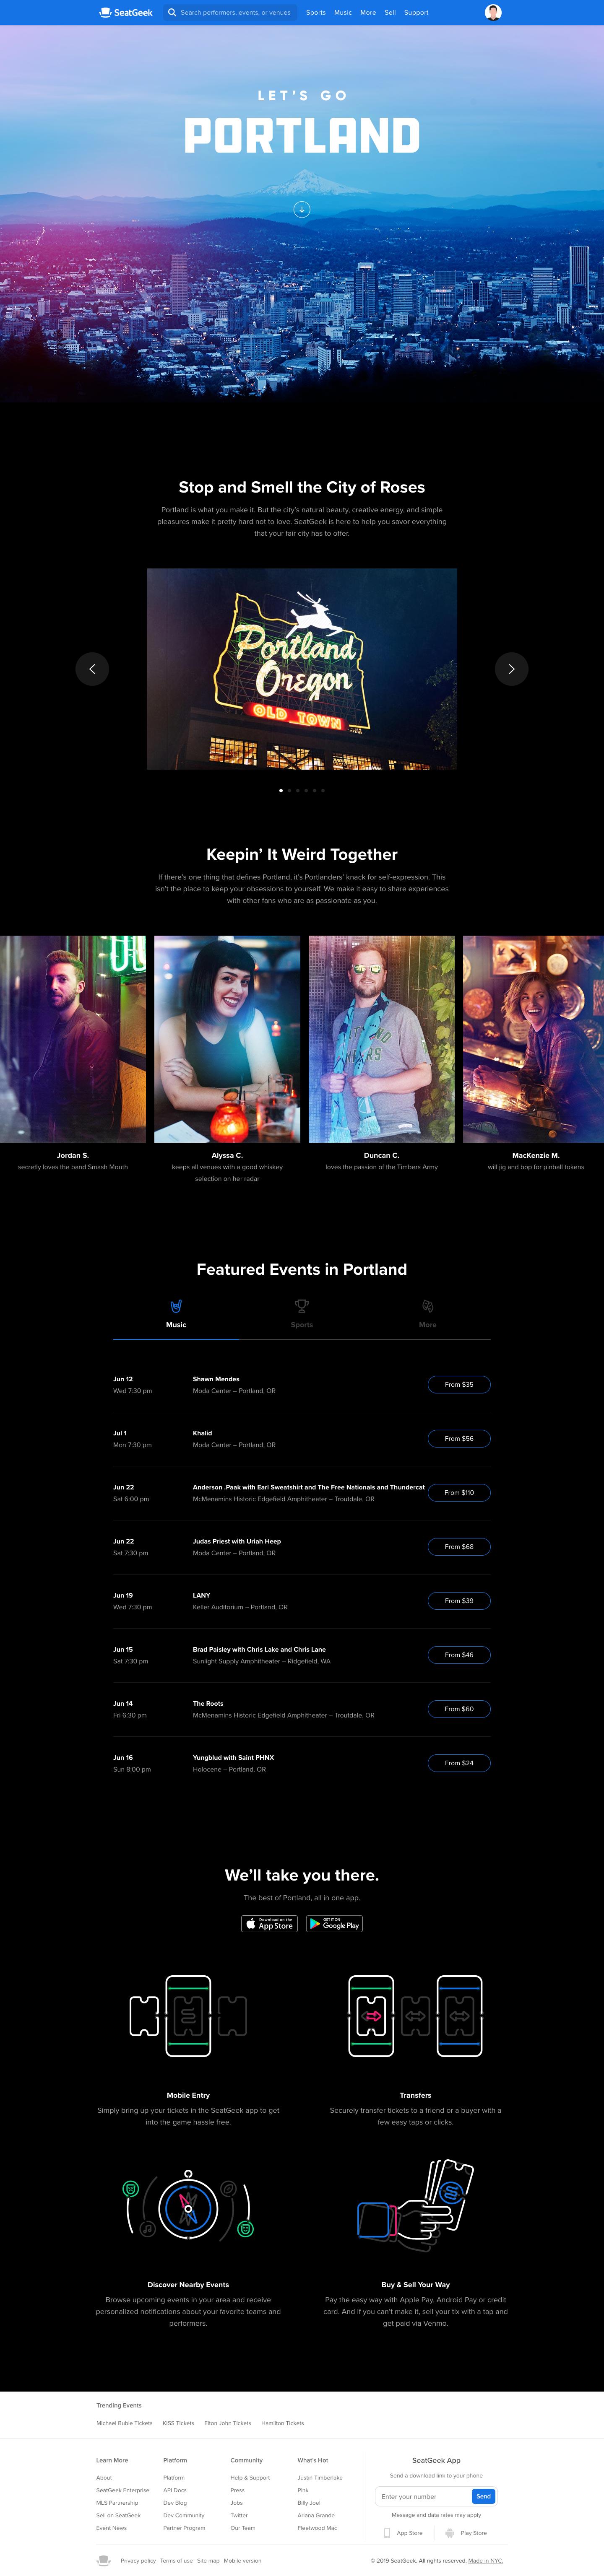 screencapture-seatgeek-portland-2019-06-11-23_09_59.png